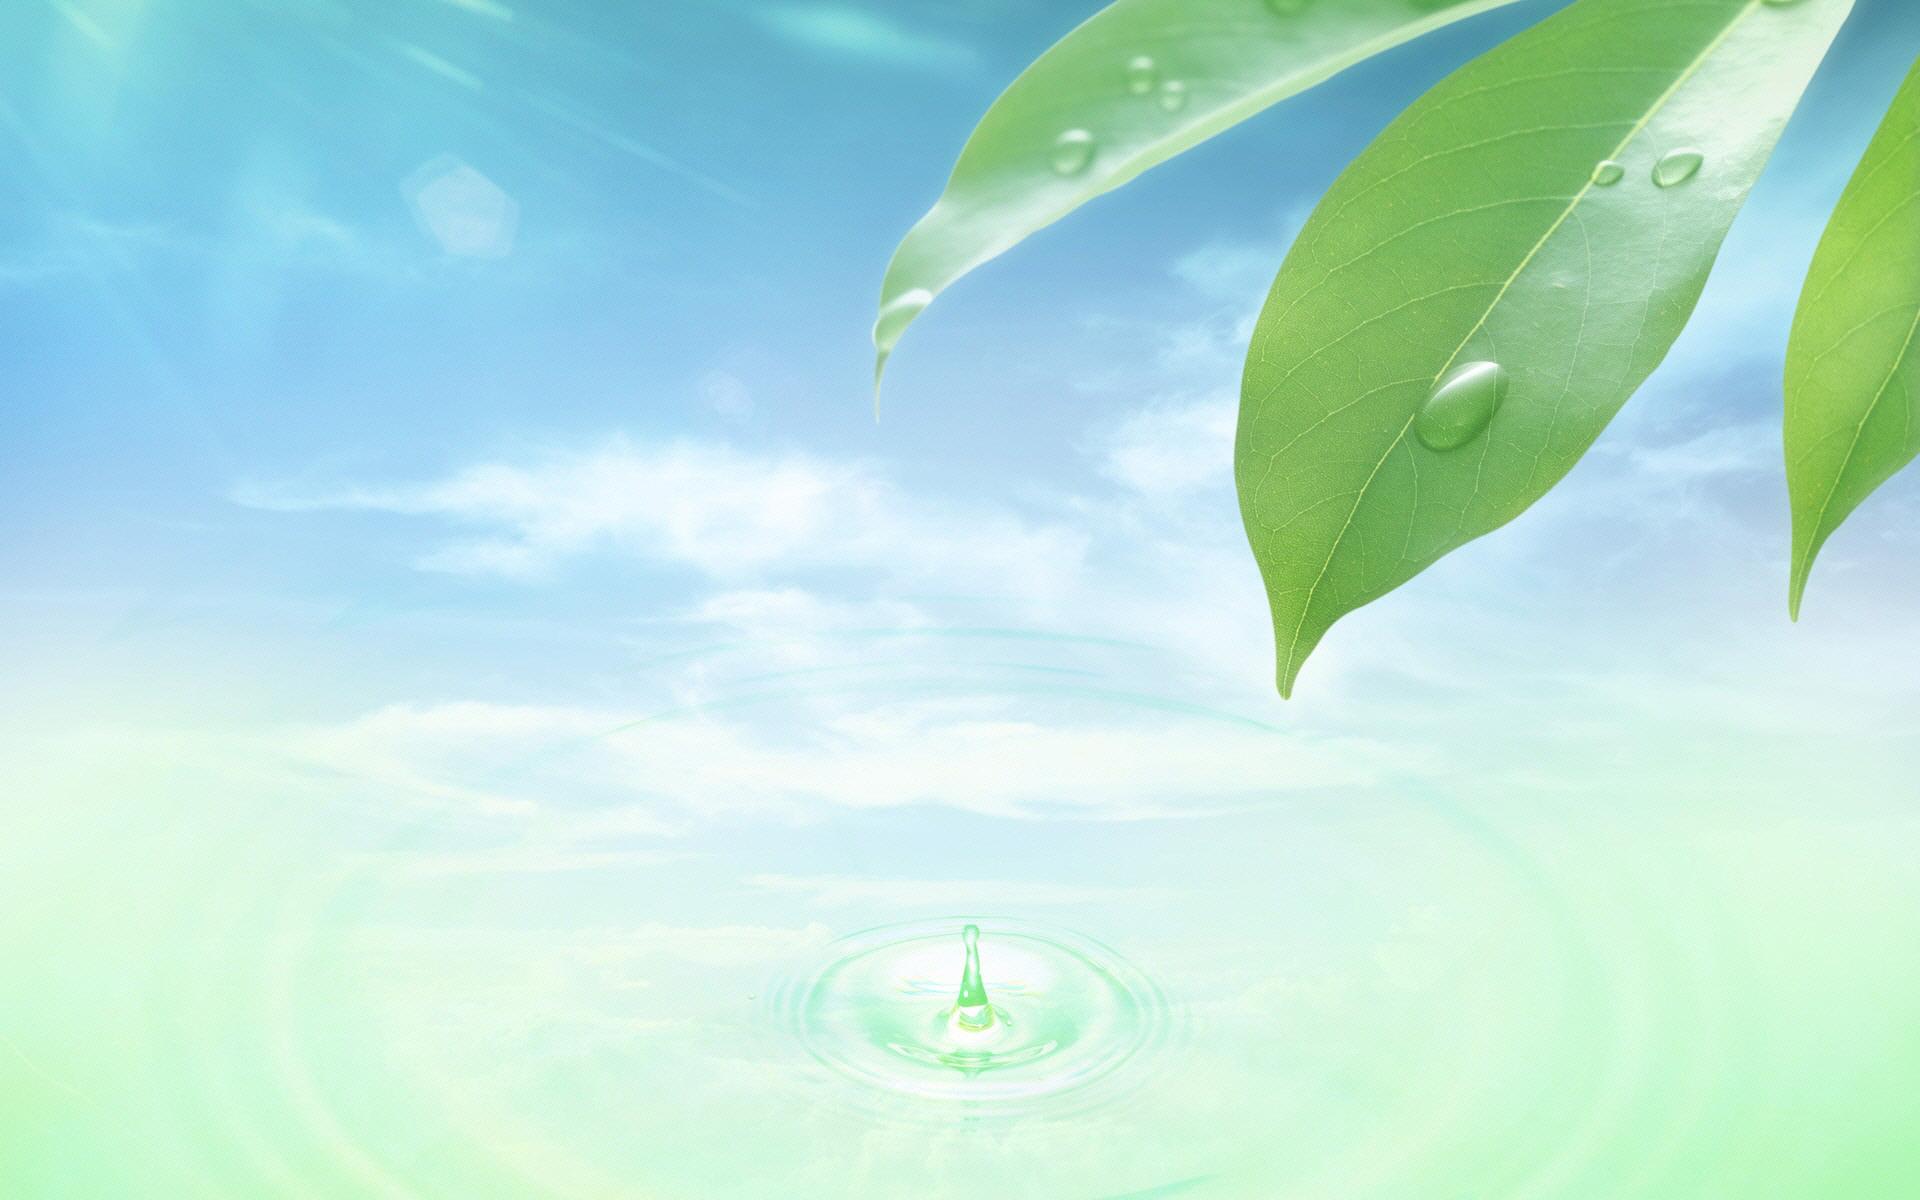 design 青山绿水大自然风景手机壁纸_风景520  绿色山水风景壁纸_第4